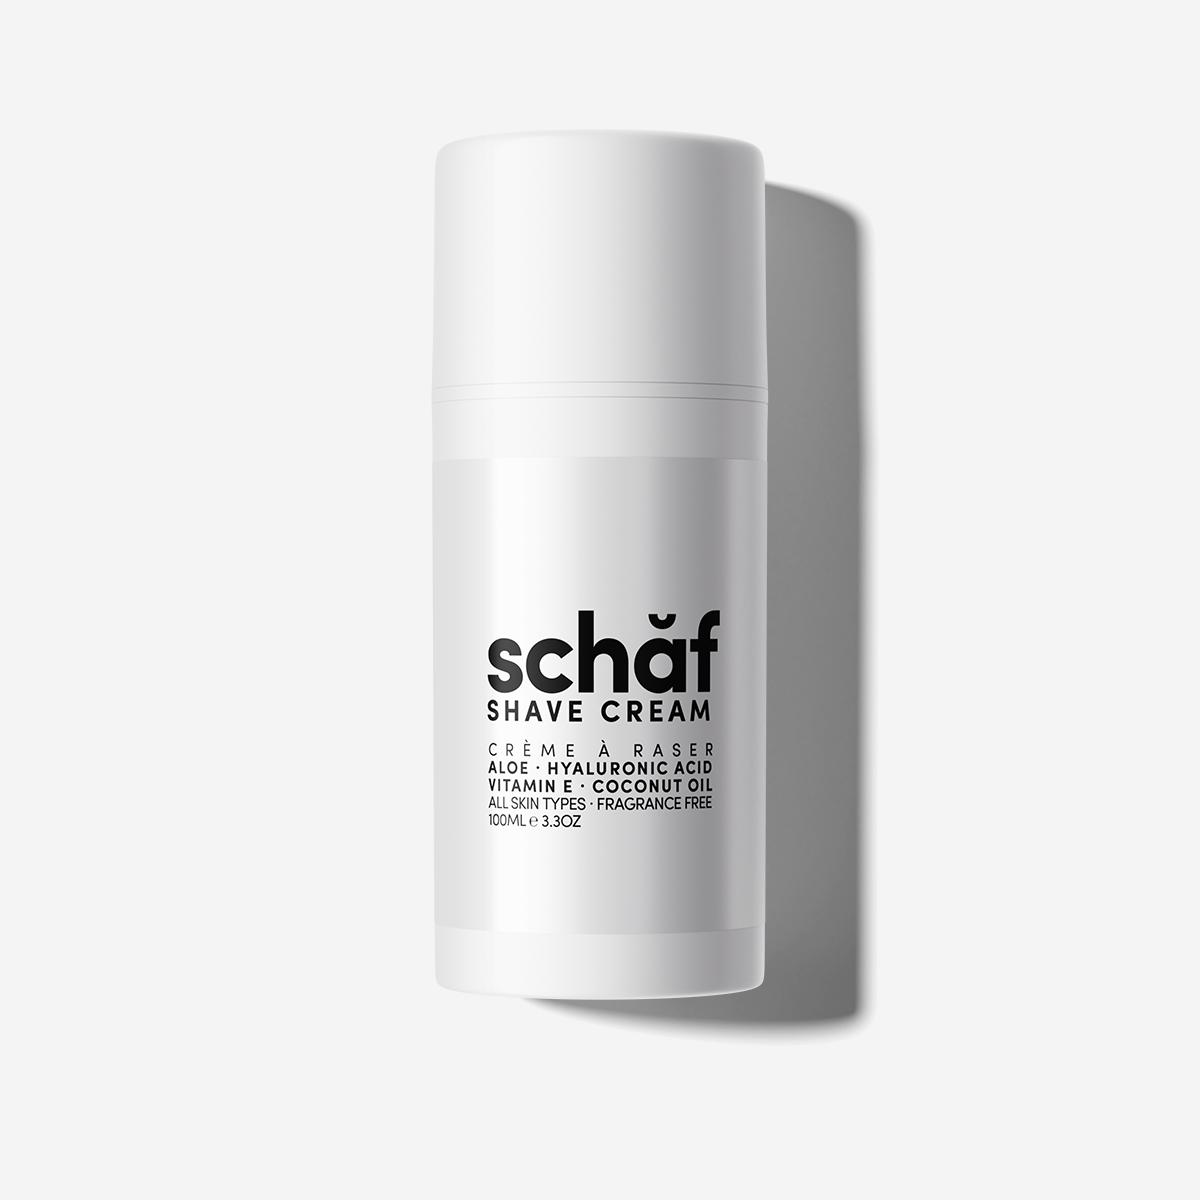 Schaf Shave Cream; best shaving cream for sensitive skin